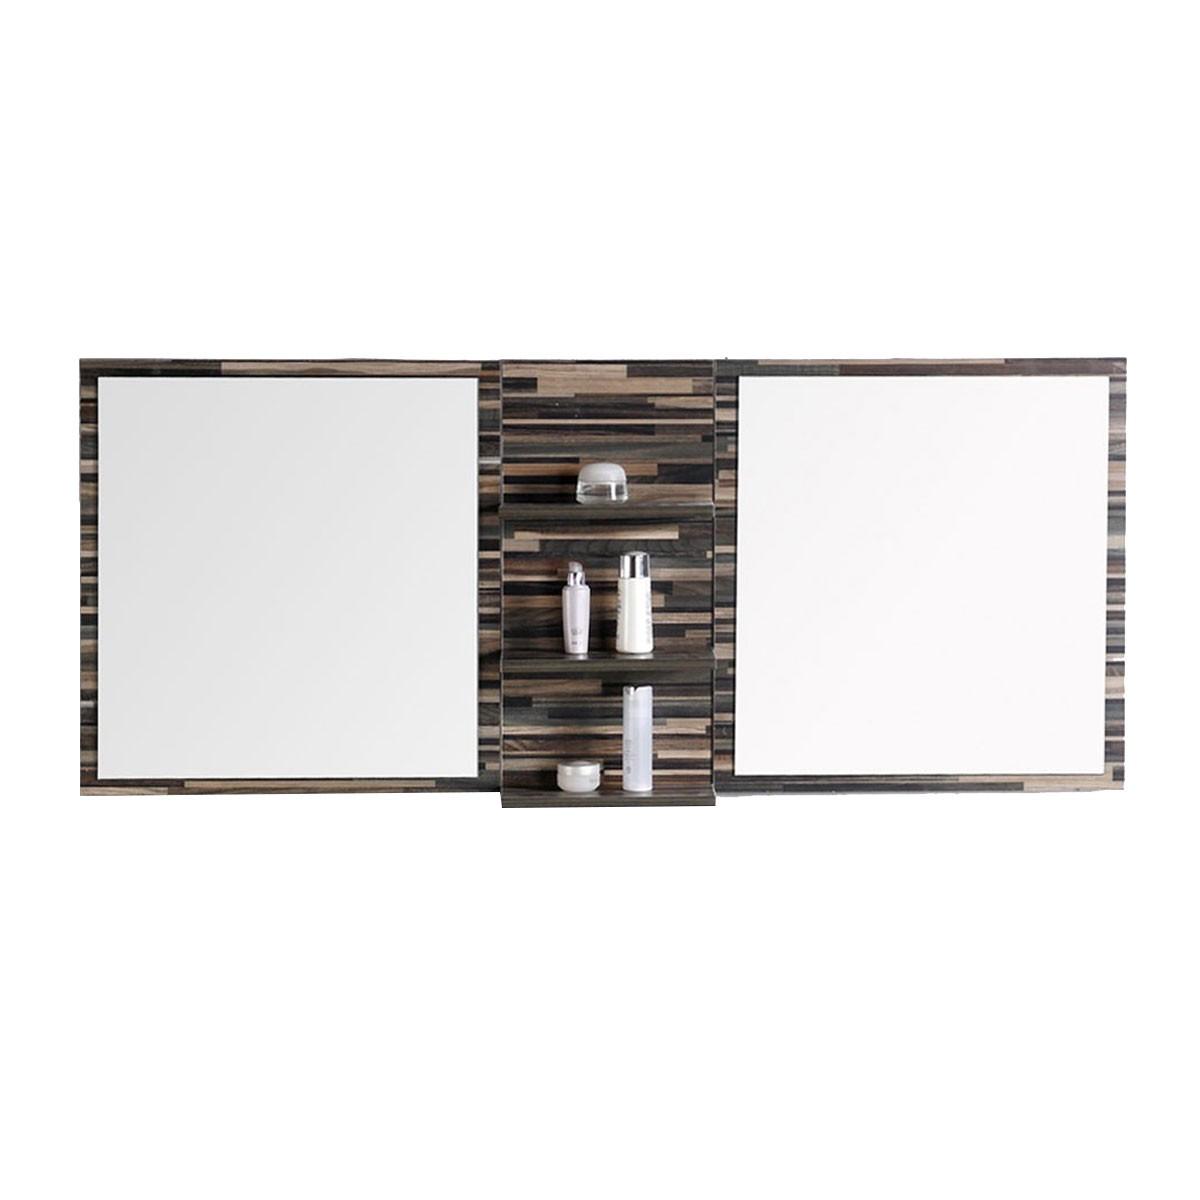 55 x 24 po Miroir pour Meuble Salle de Bain (VS-8861-M)